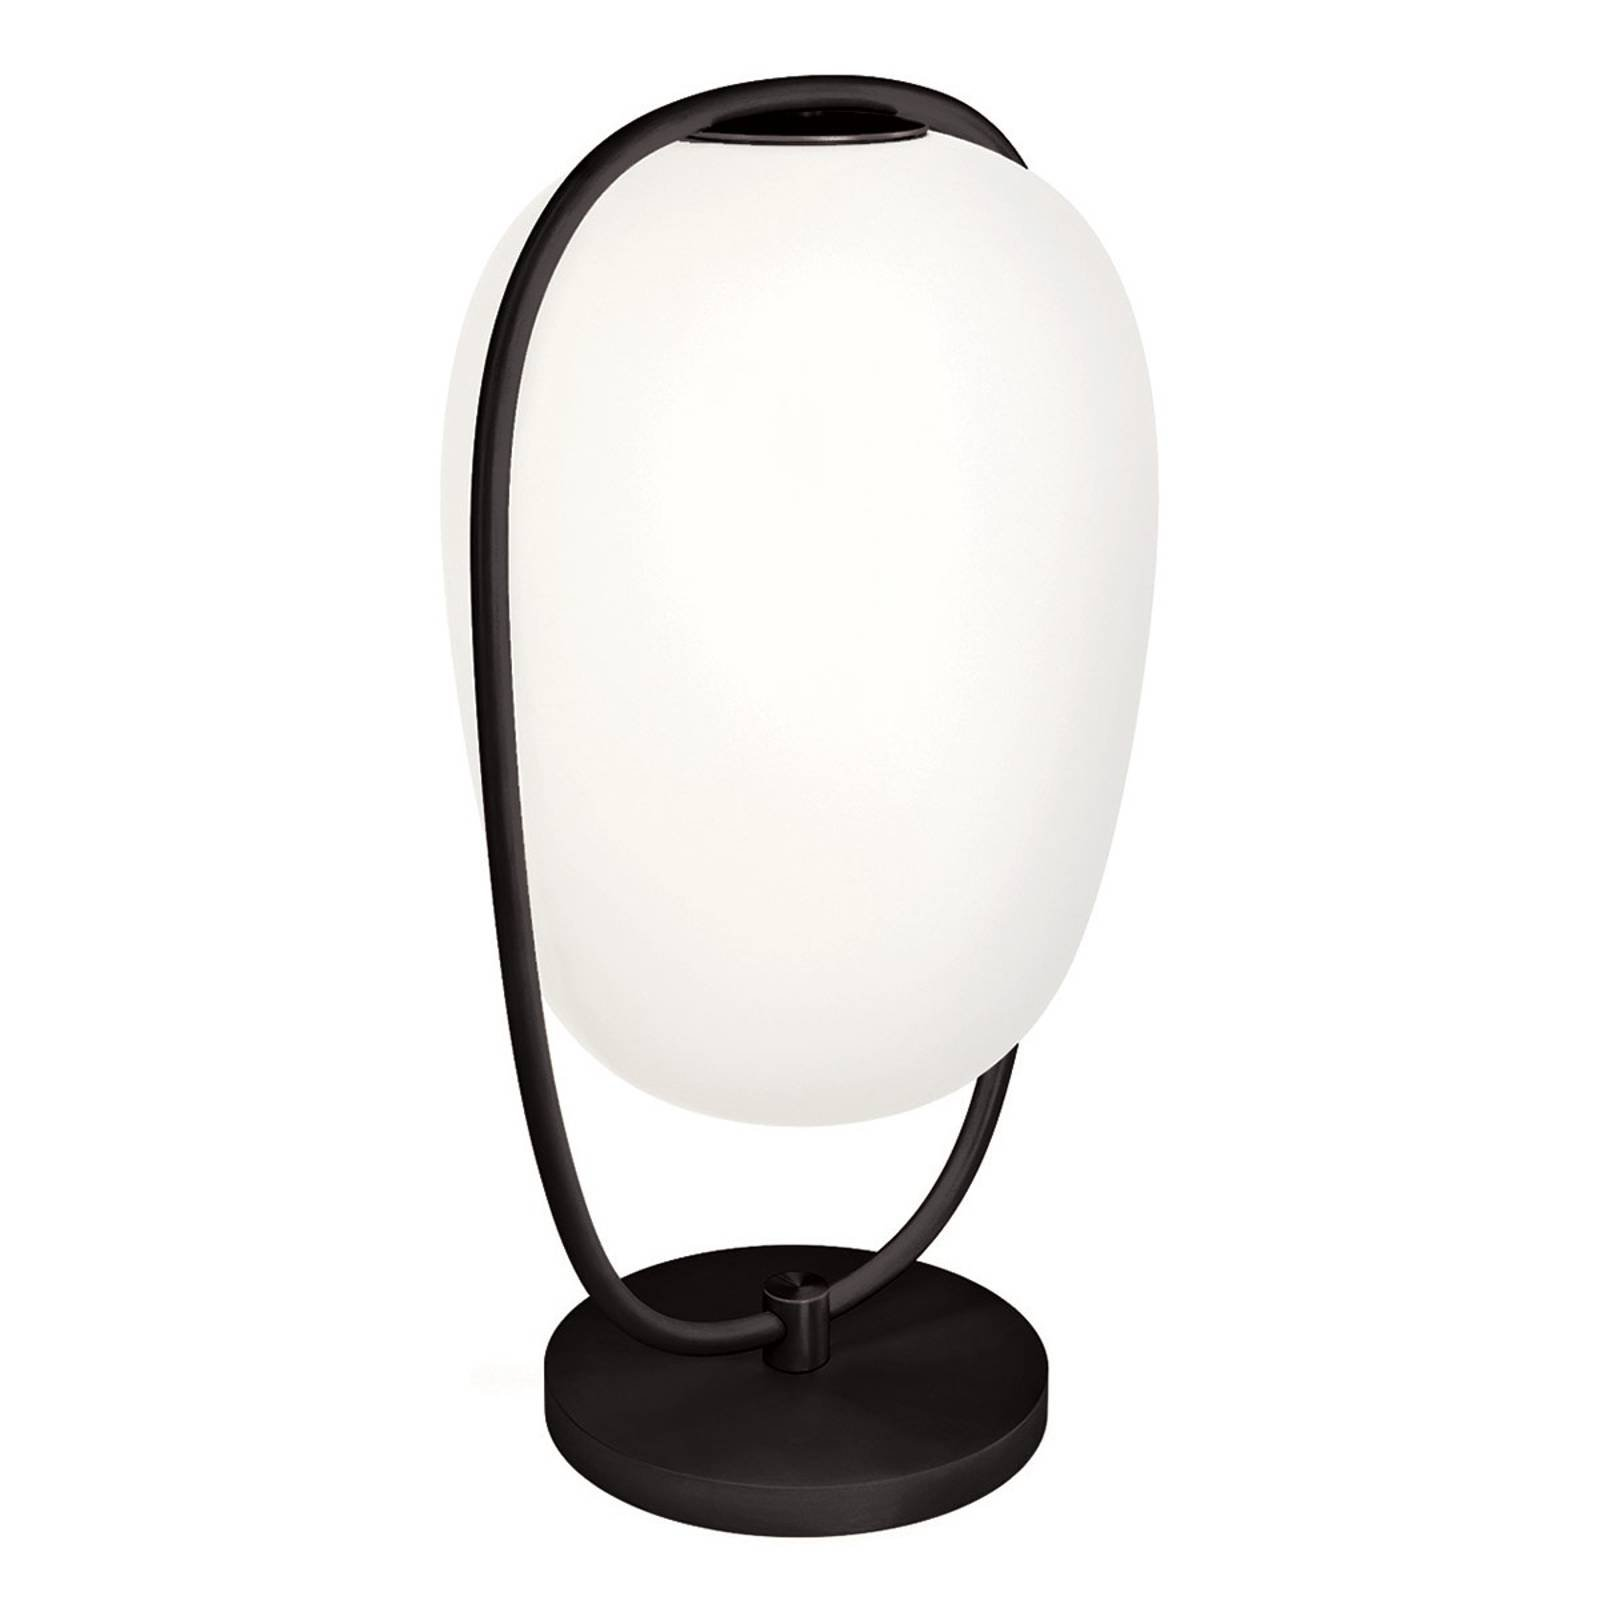 Kundalini Lannà bordlampa, svart/hvit